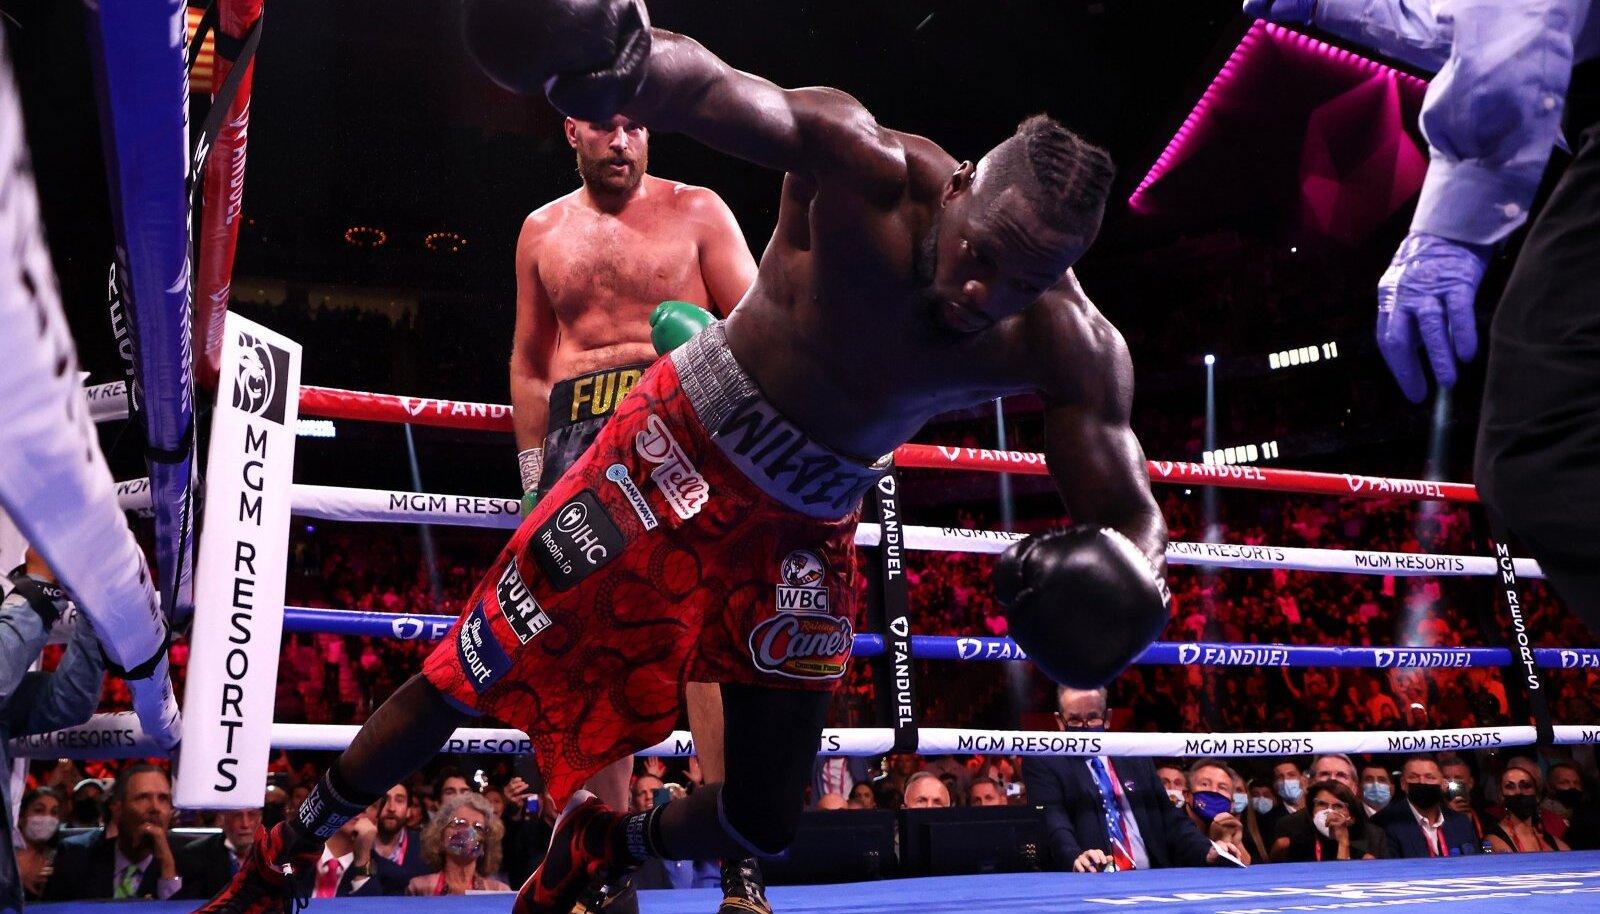 Tyson Fury viimane hoop, Deontay Wilder kukub lõplikult.